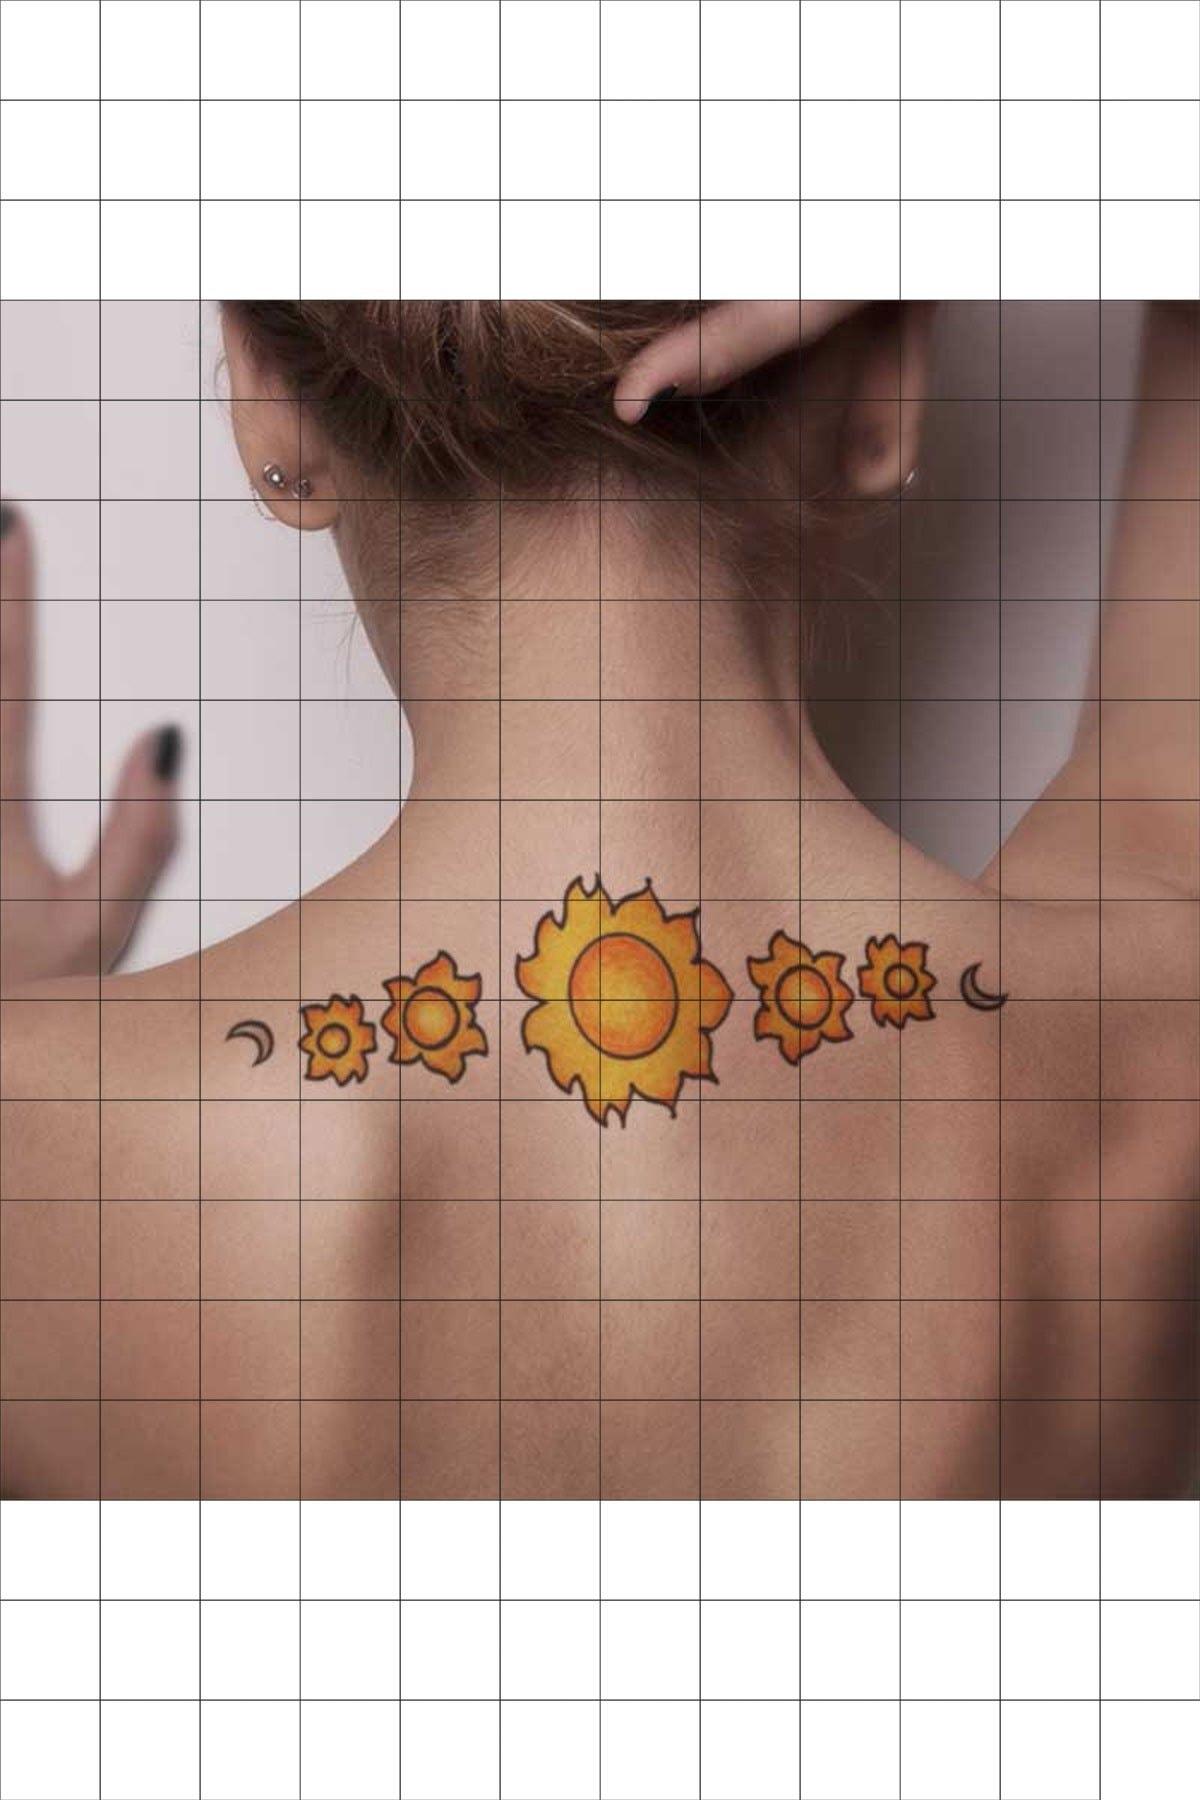 TatFast Gök 1553 Geçici Dövme Flash Tattoo 1